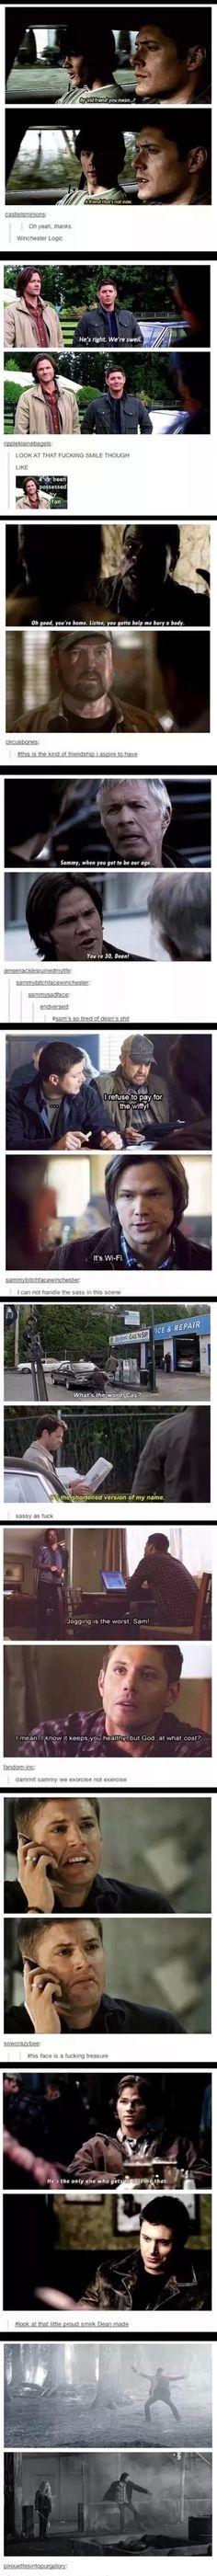 oh so supernatural.... pardon the language